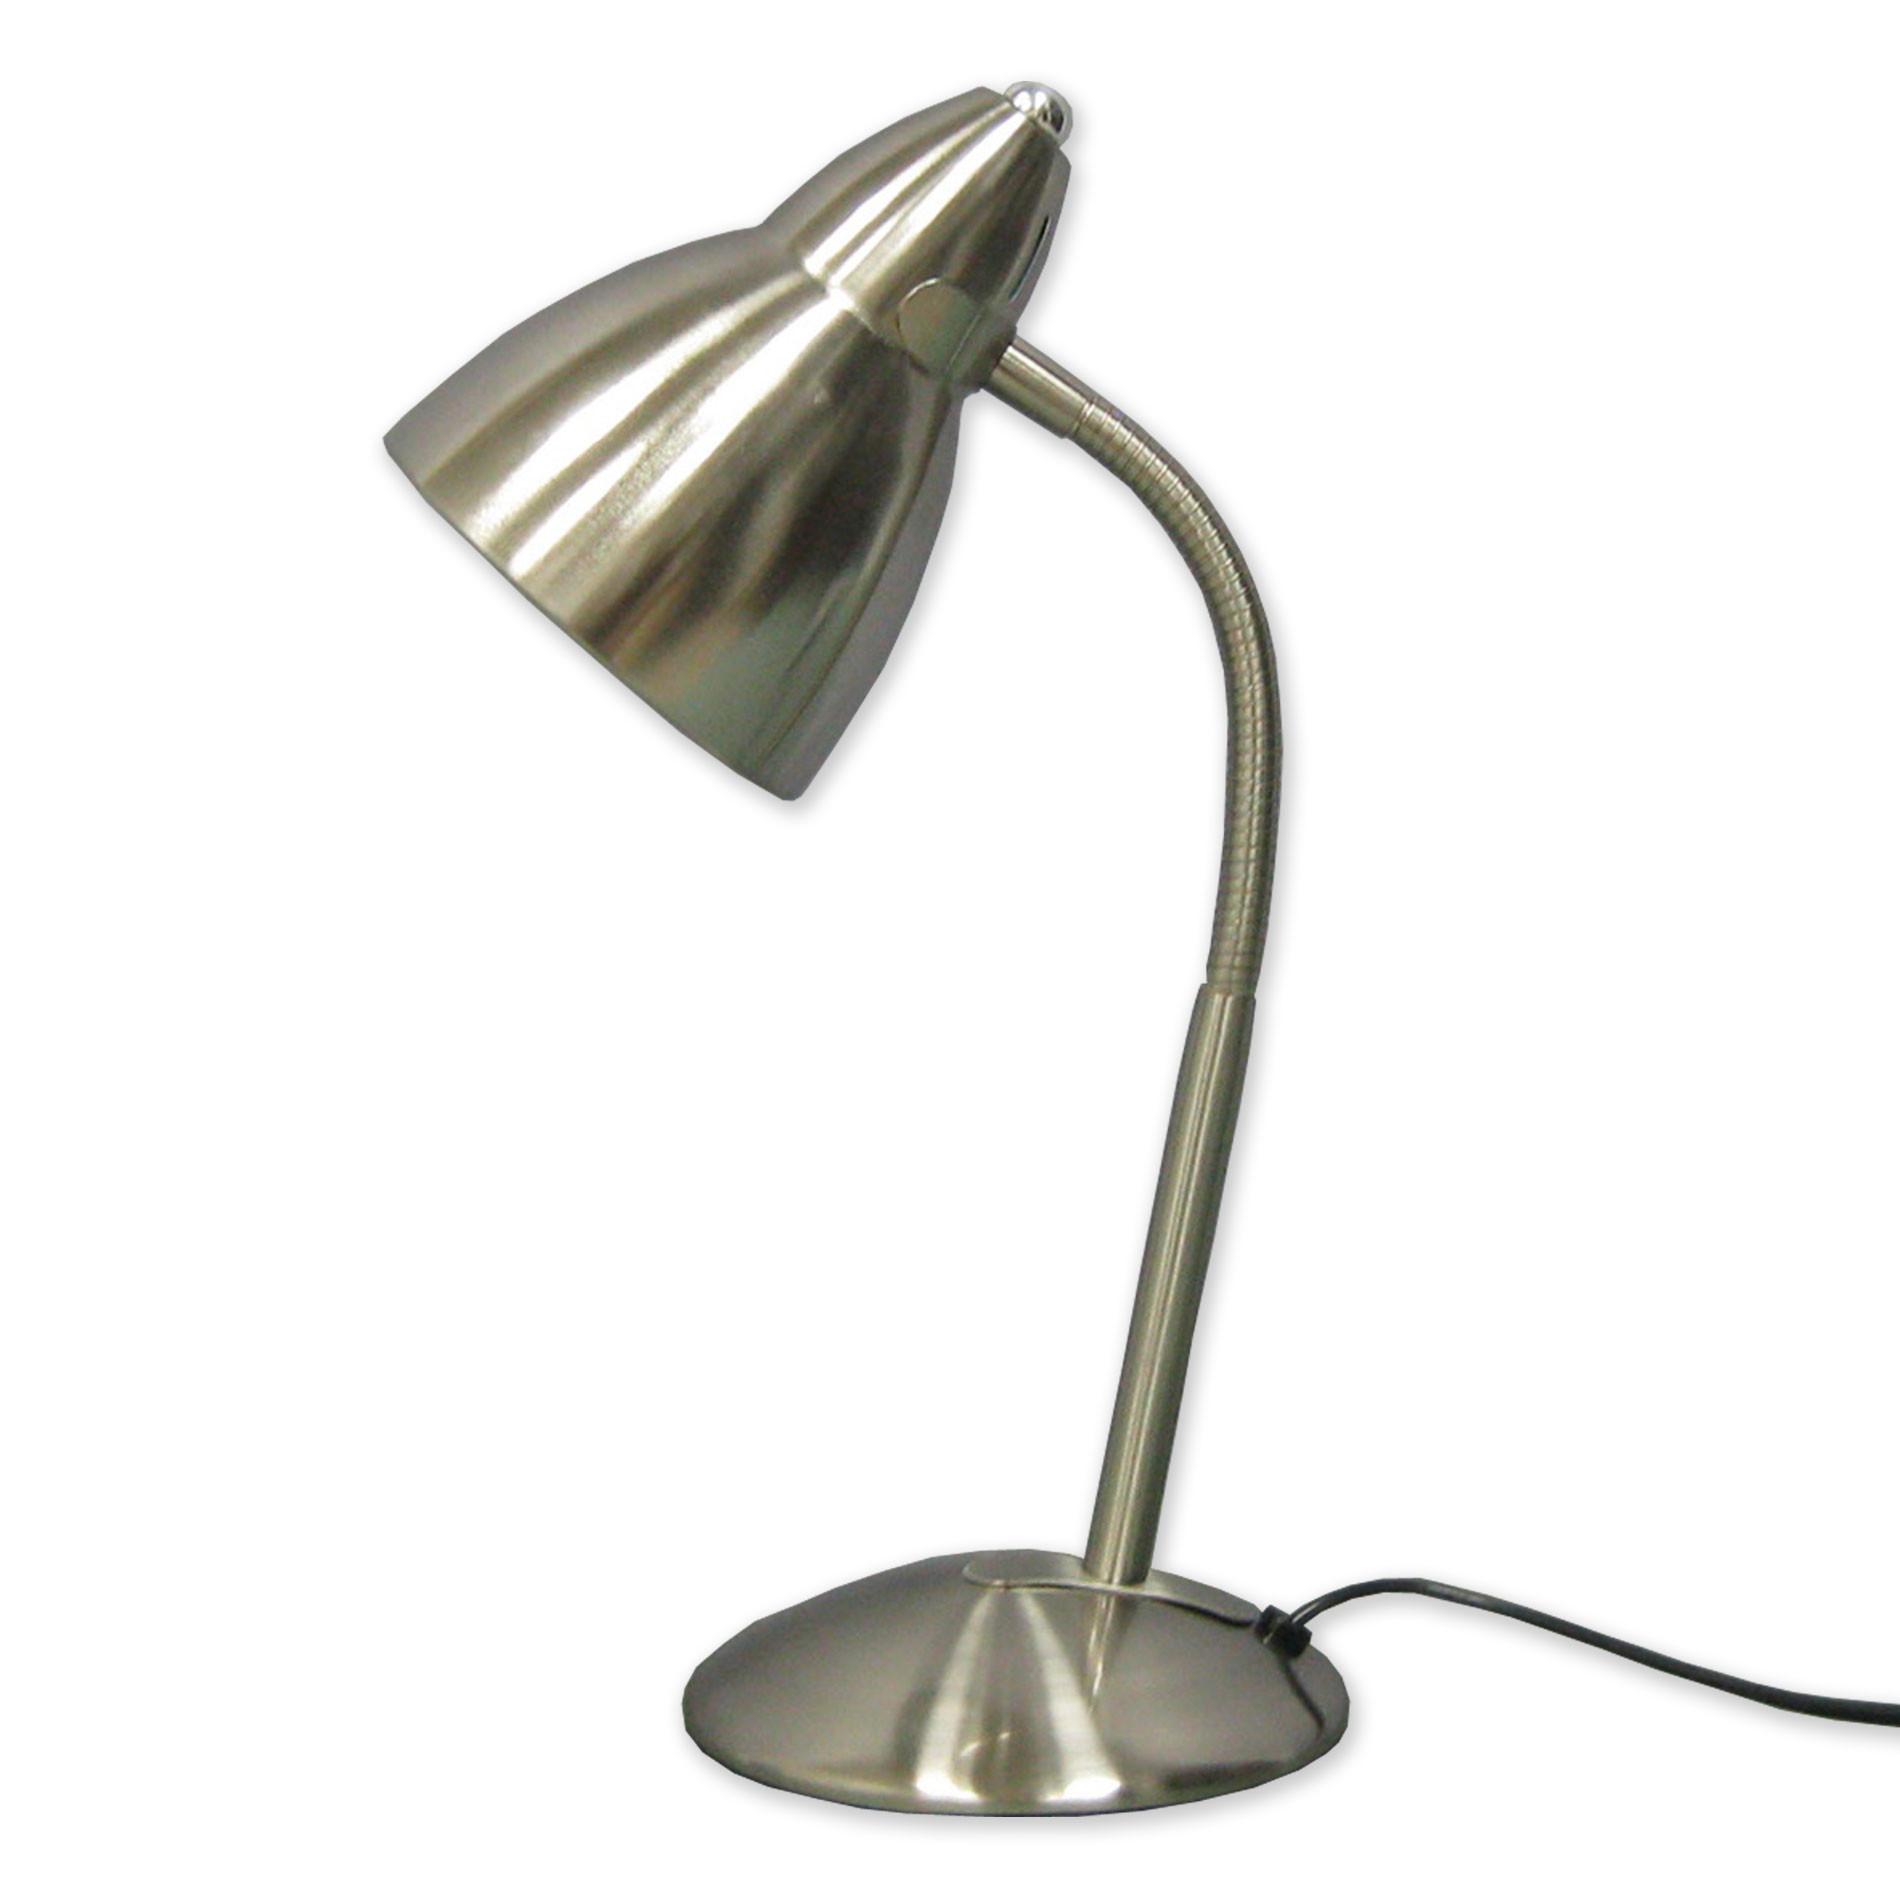 Best ideas about Gooseneck Desk Lamp . Save or Pin Essential Home Gooseneck Desk Lamp – Silver Now.